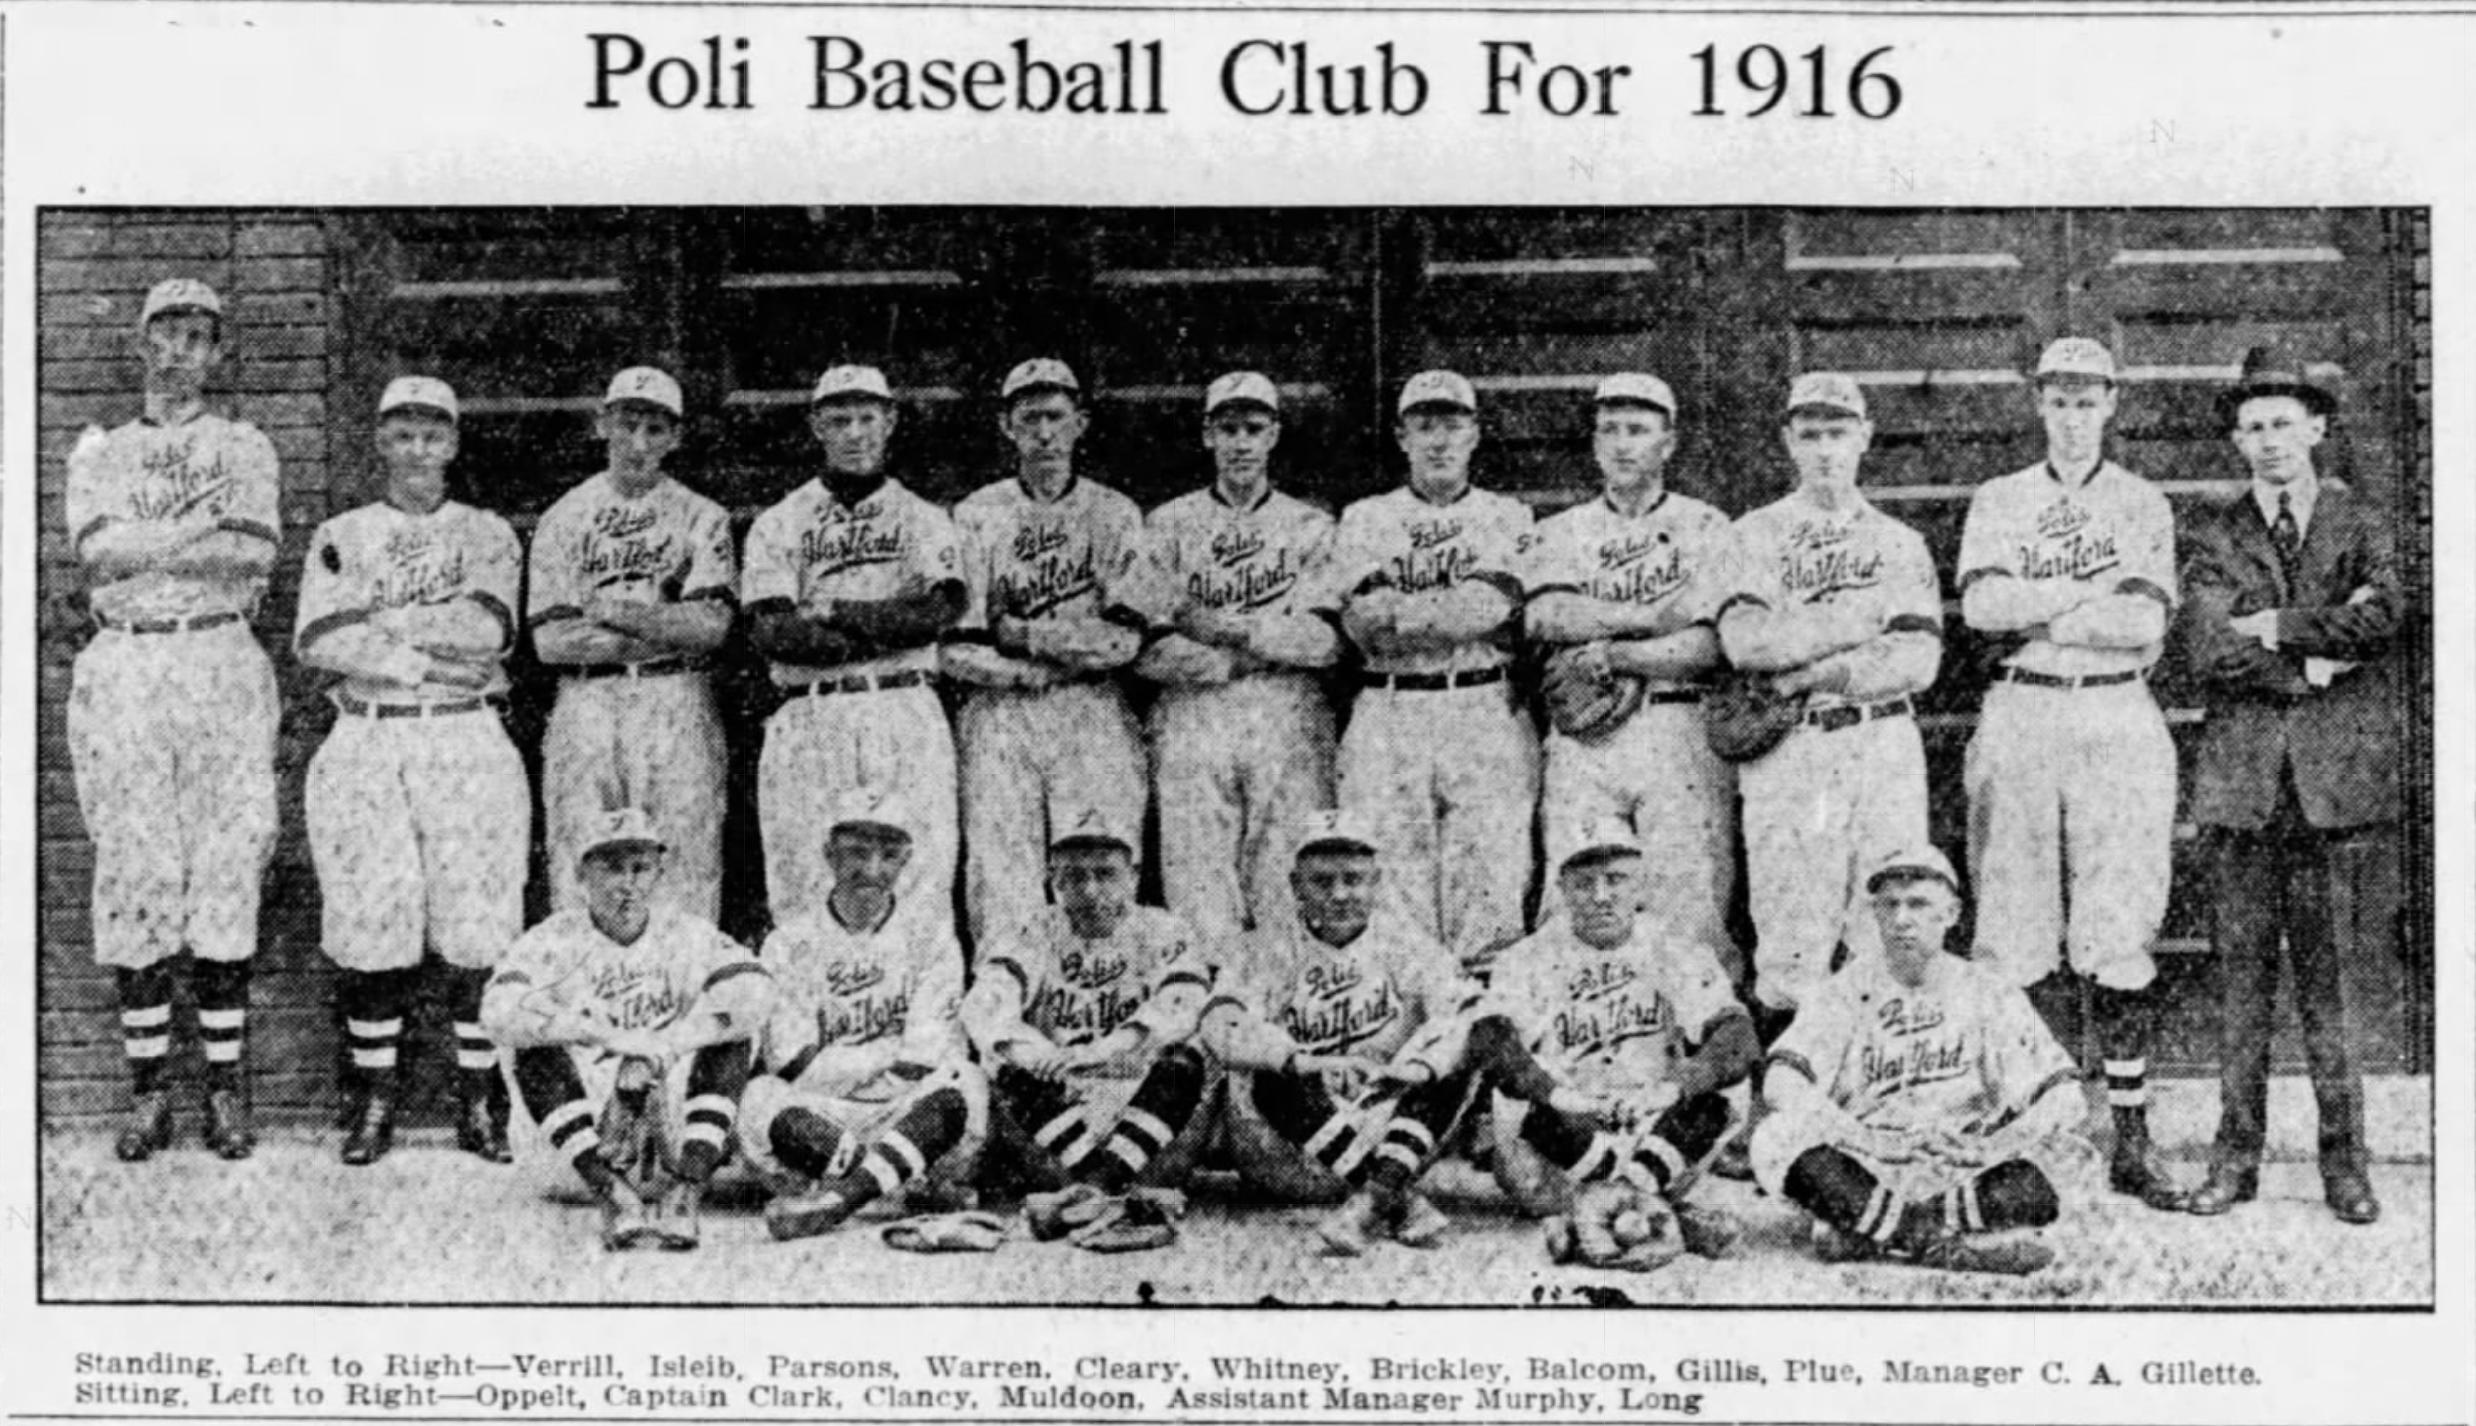 1916 Poli Baseball Club